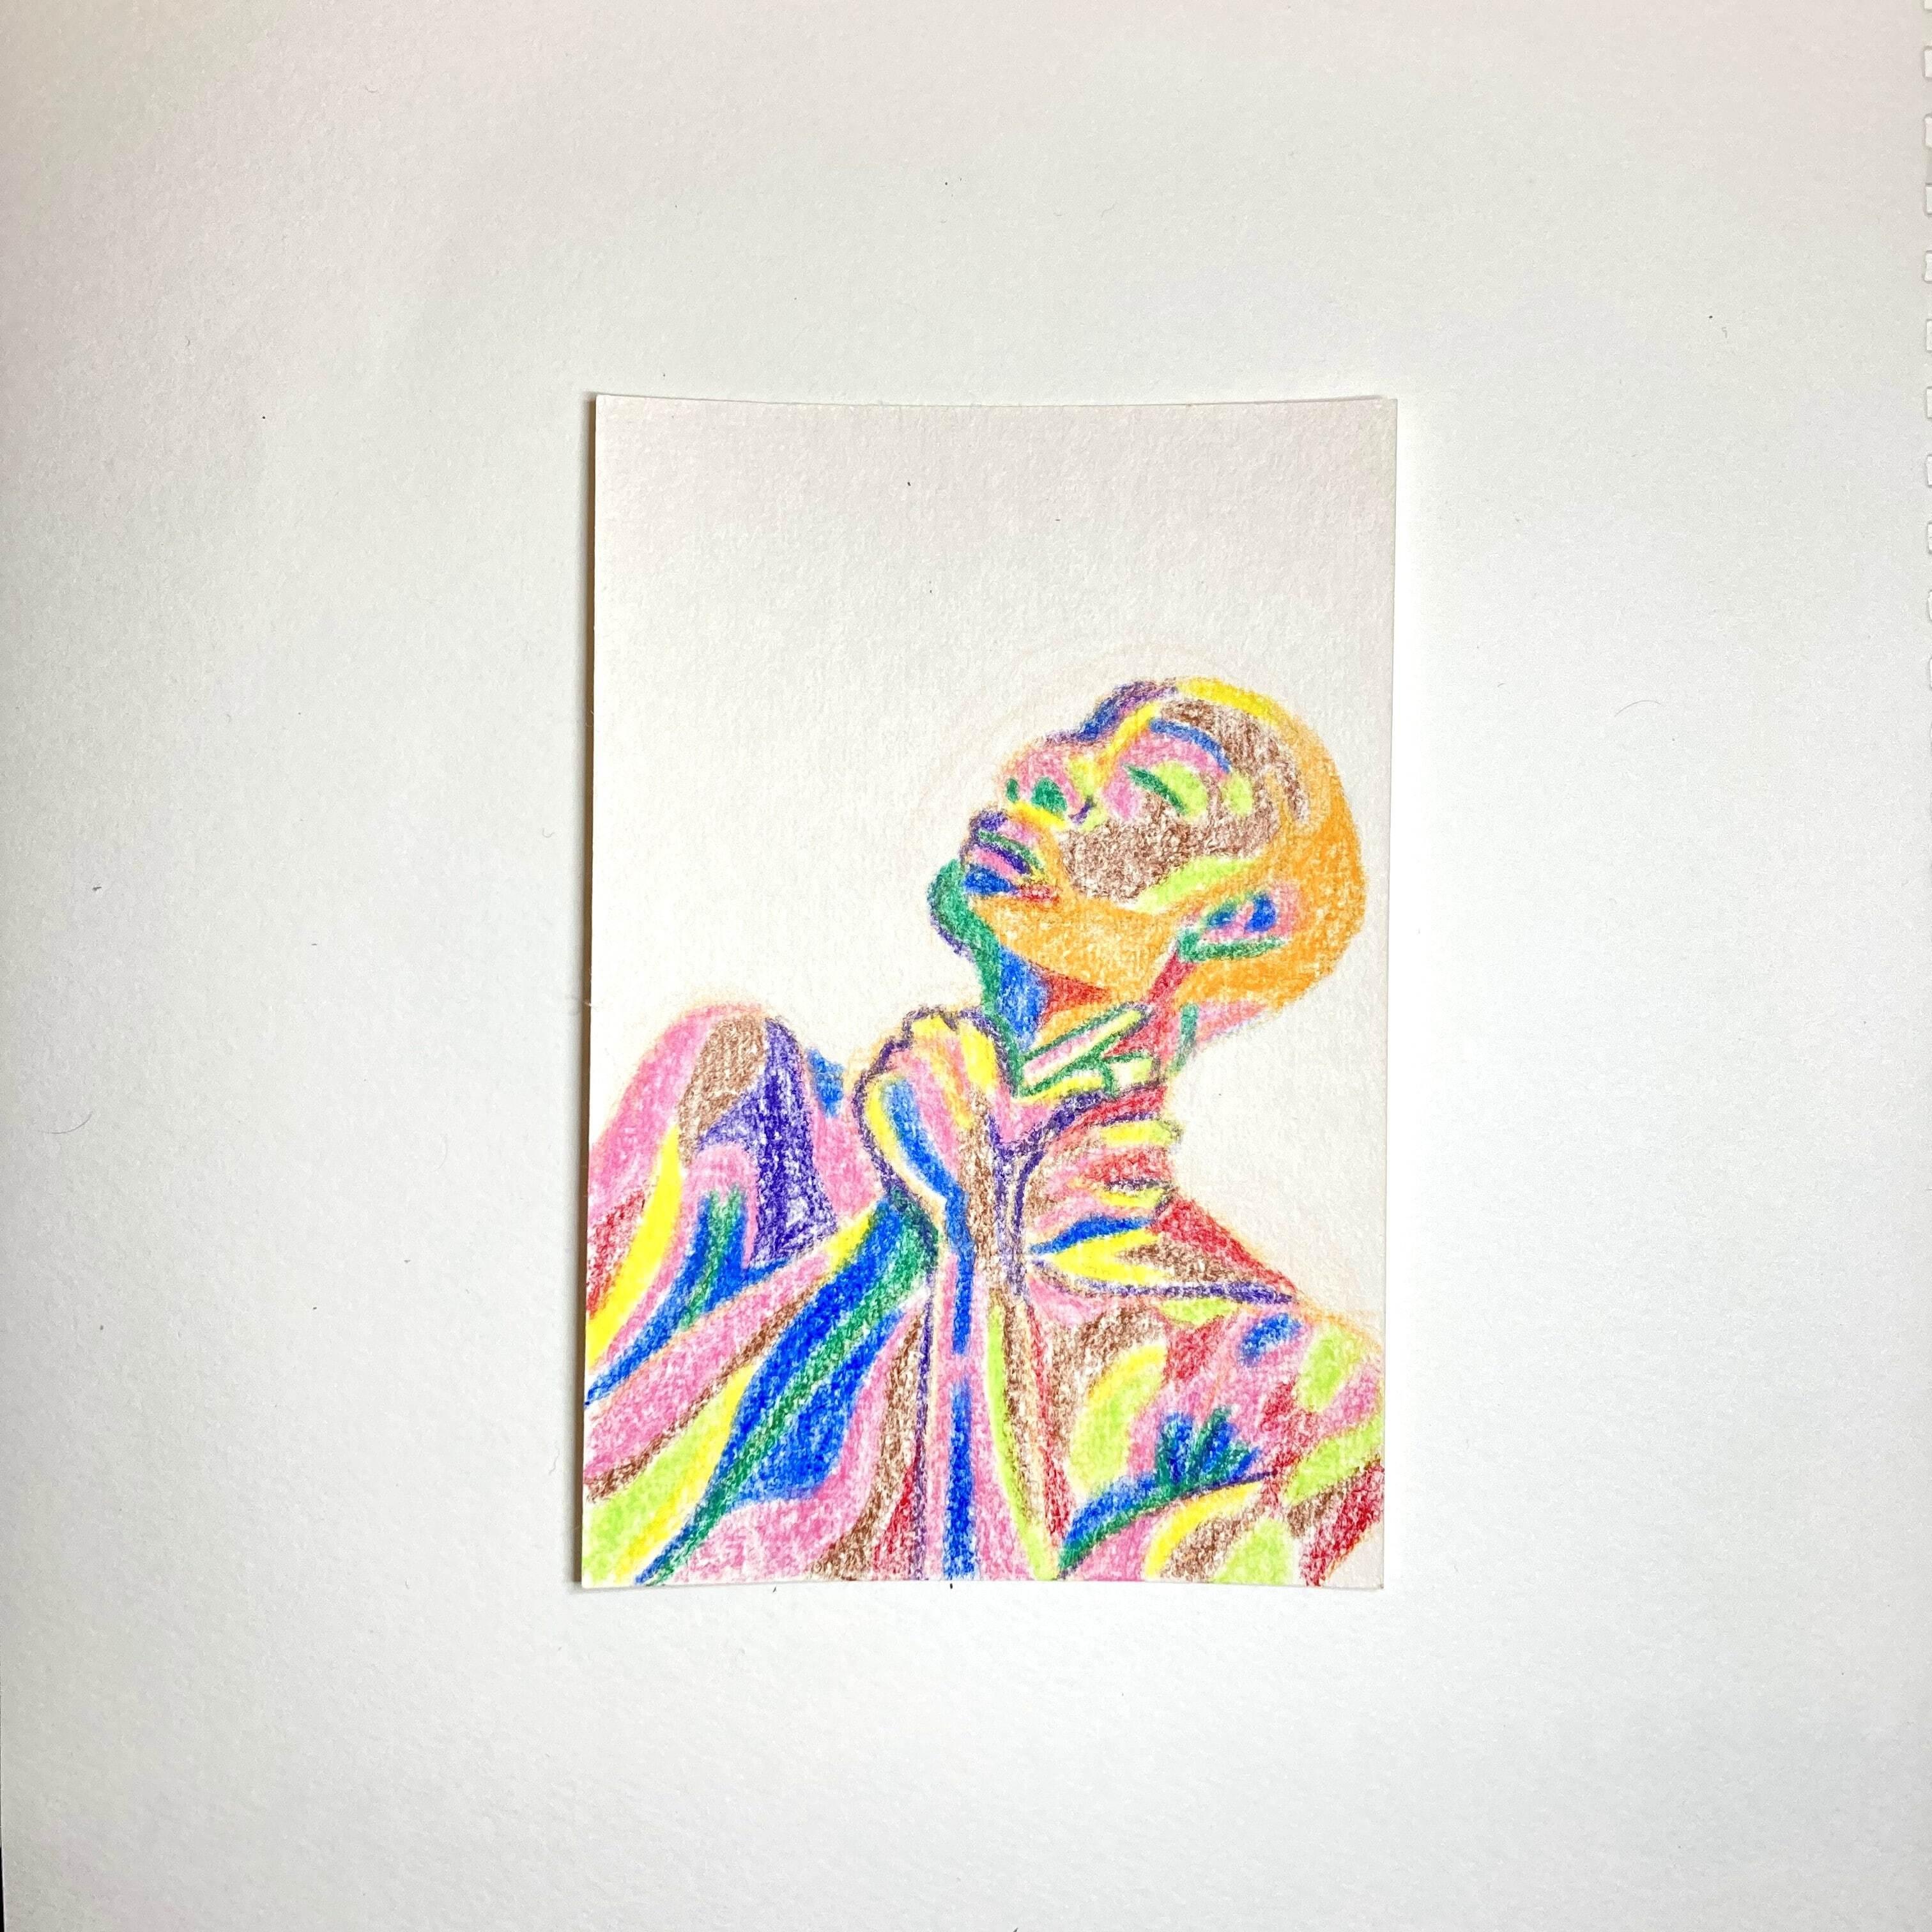 VARIOUS DRAWING / 100mm×148mm / Crayon / Original Drawing